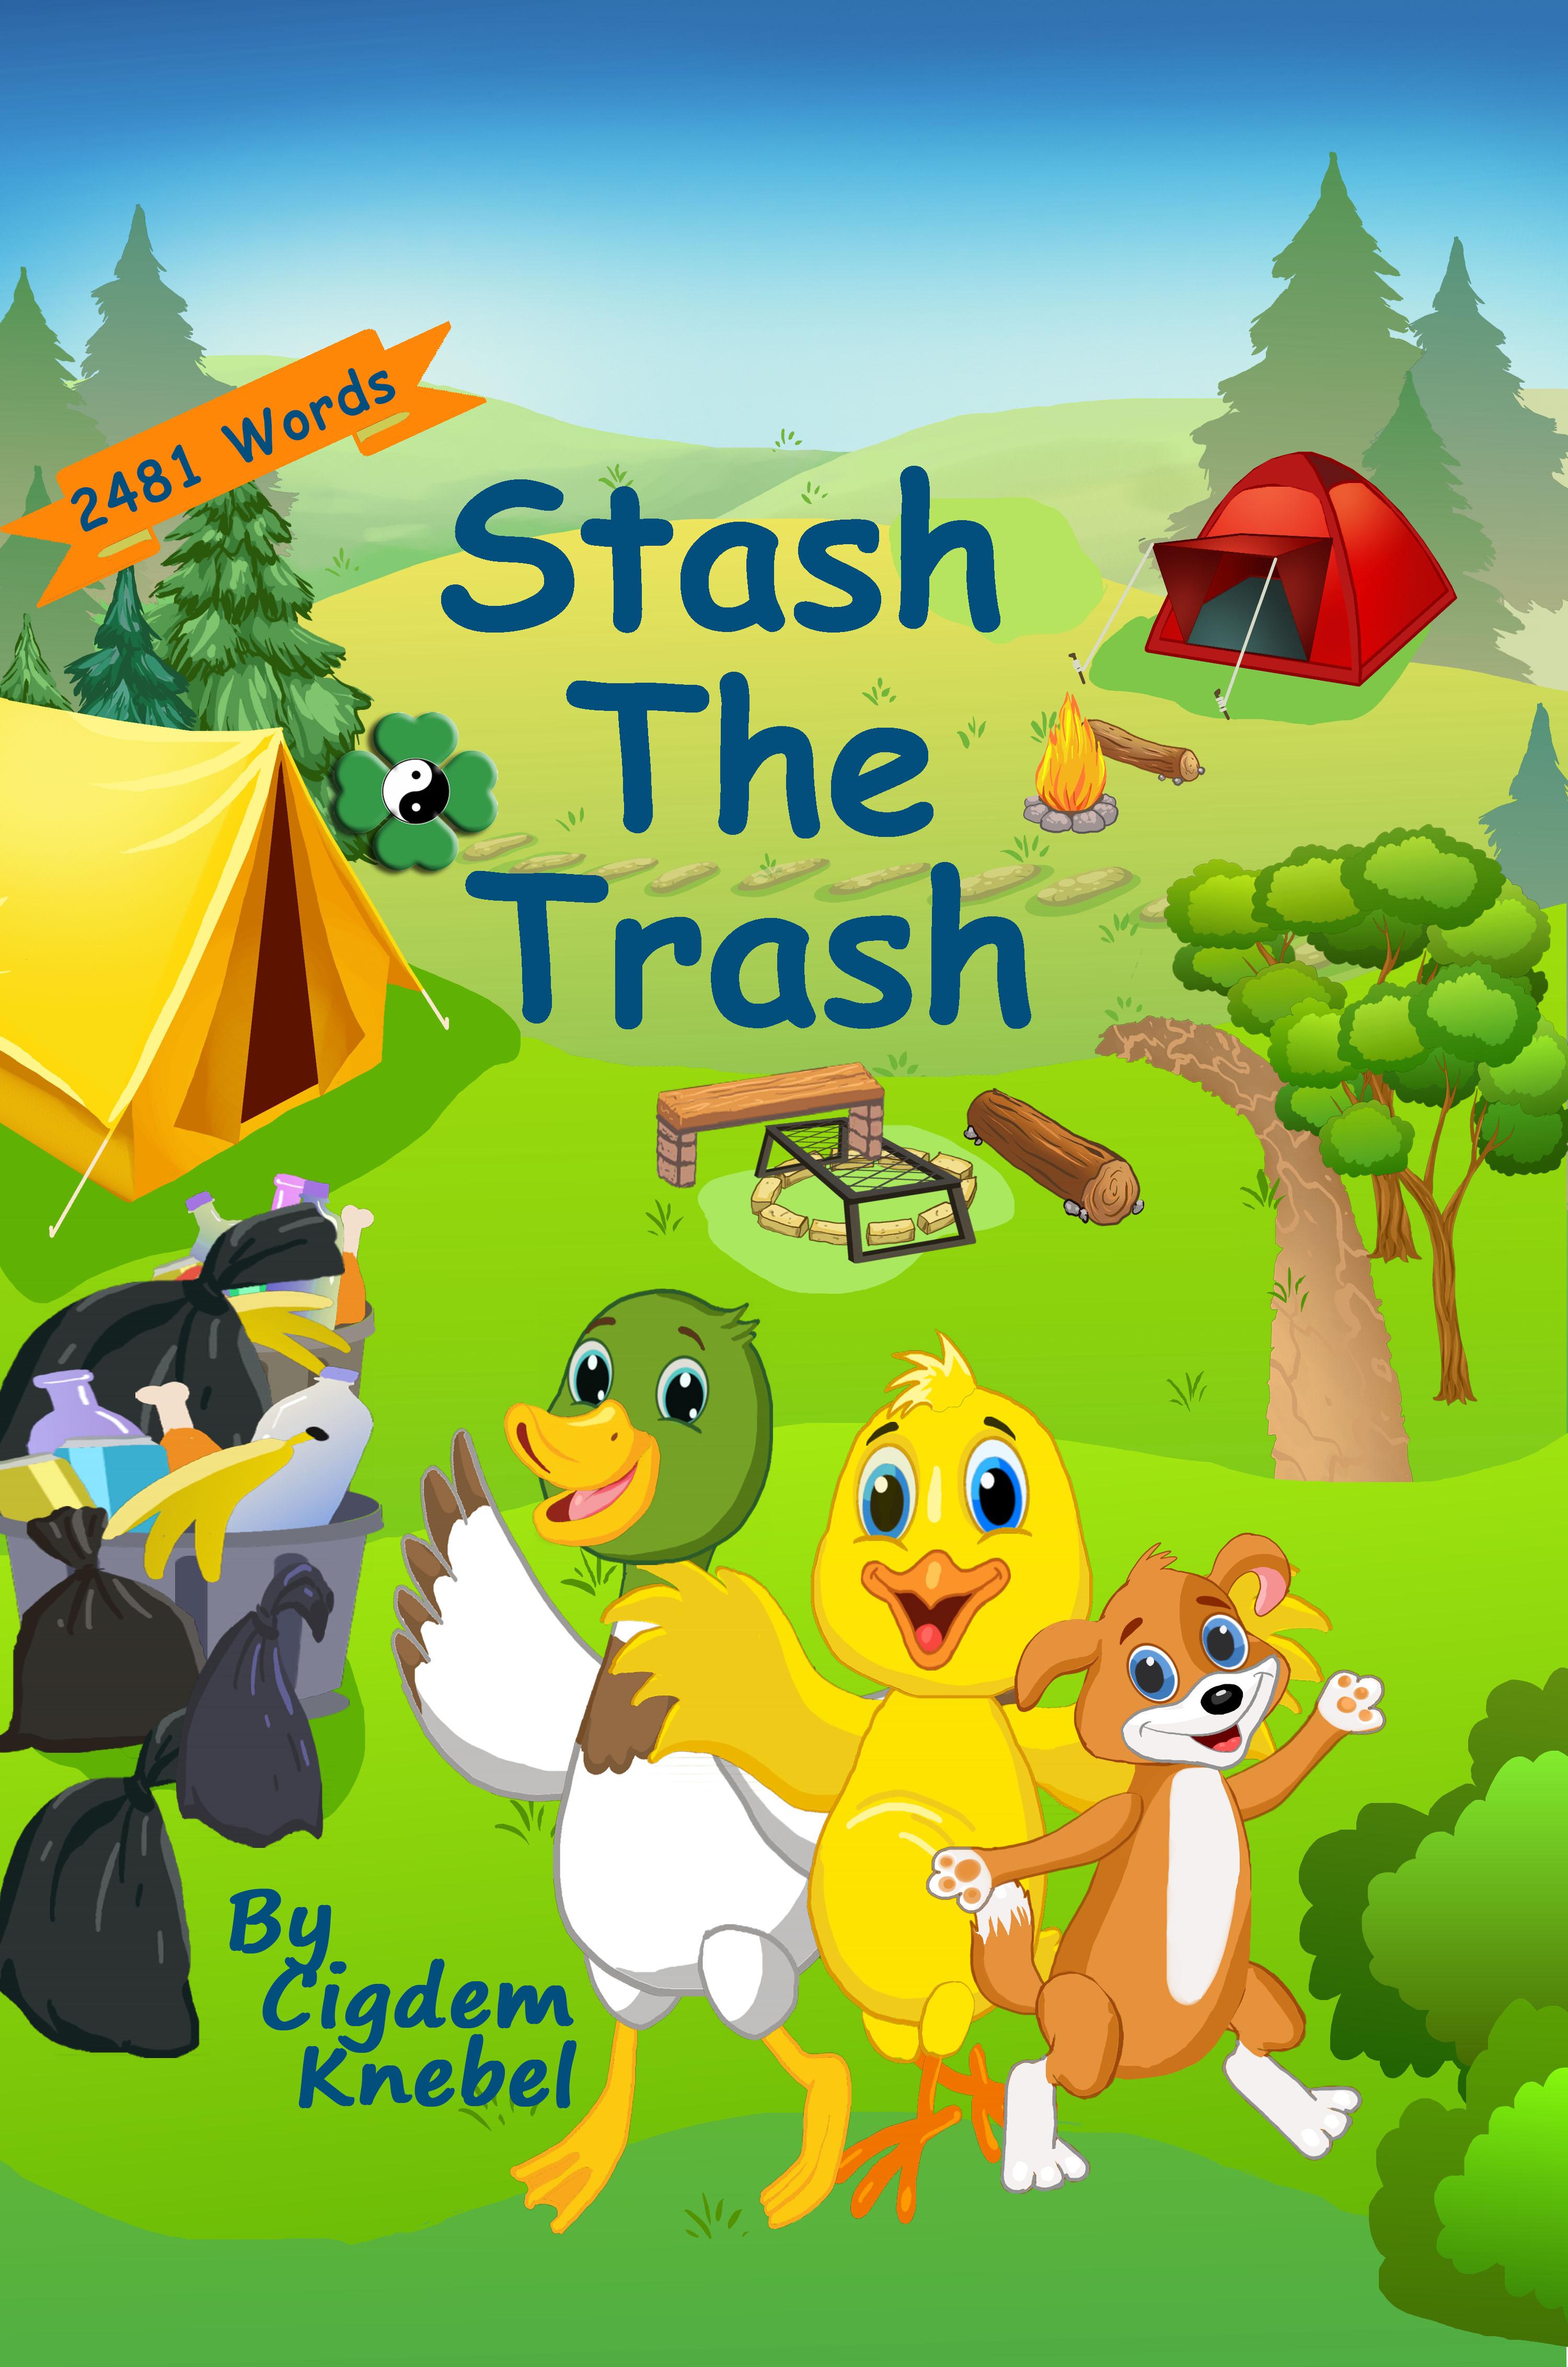 Stash The Trash- Simple Words Books